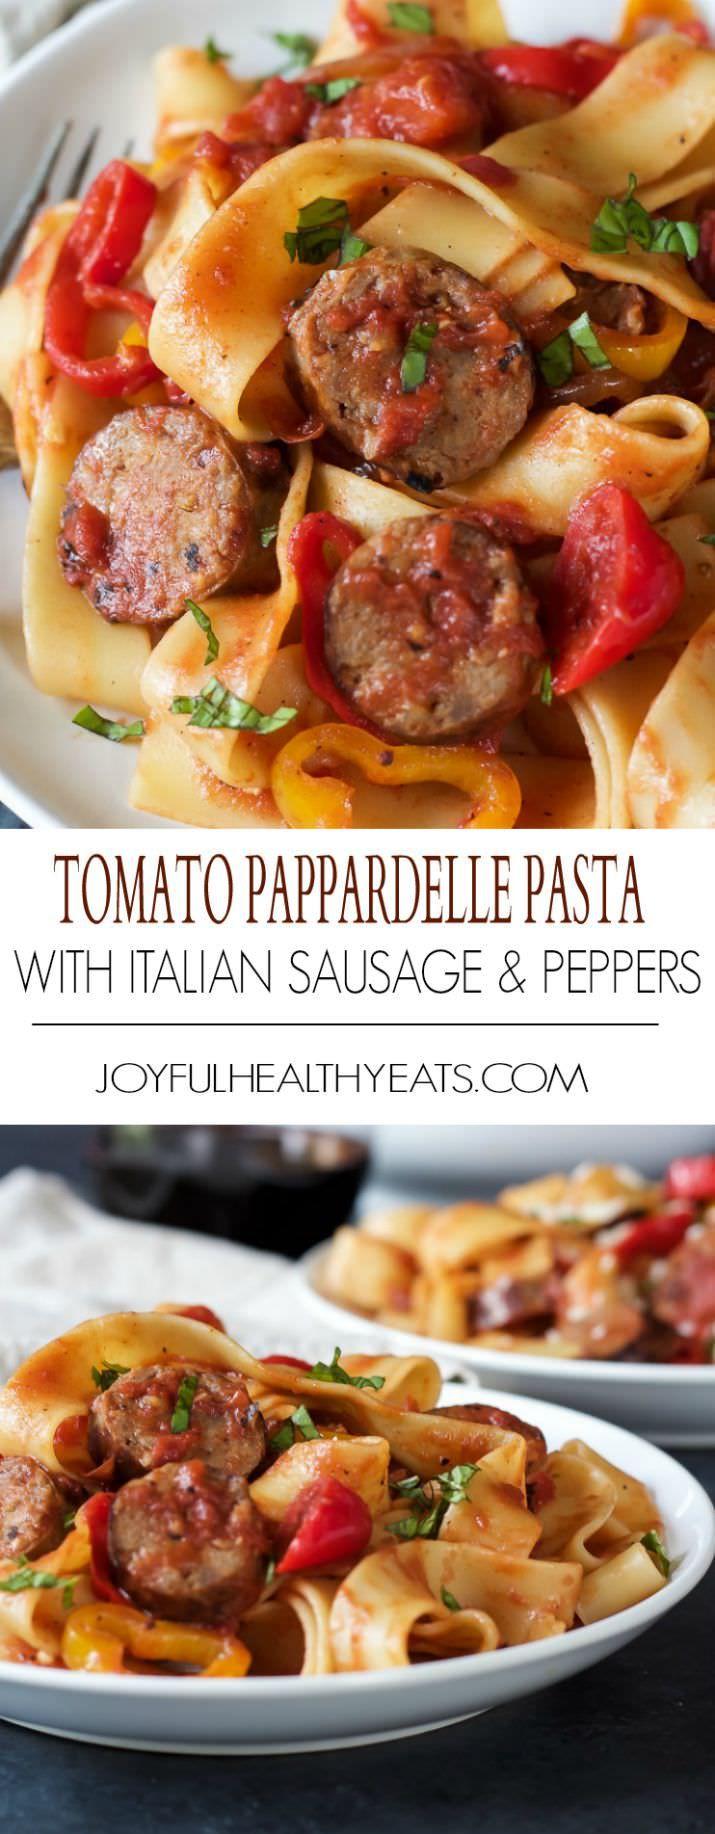 Healthy Italian Sausage Recipes  100 Italian Sausage Recipes on Pinterest